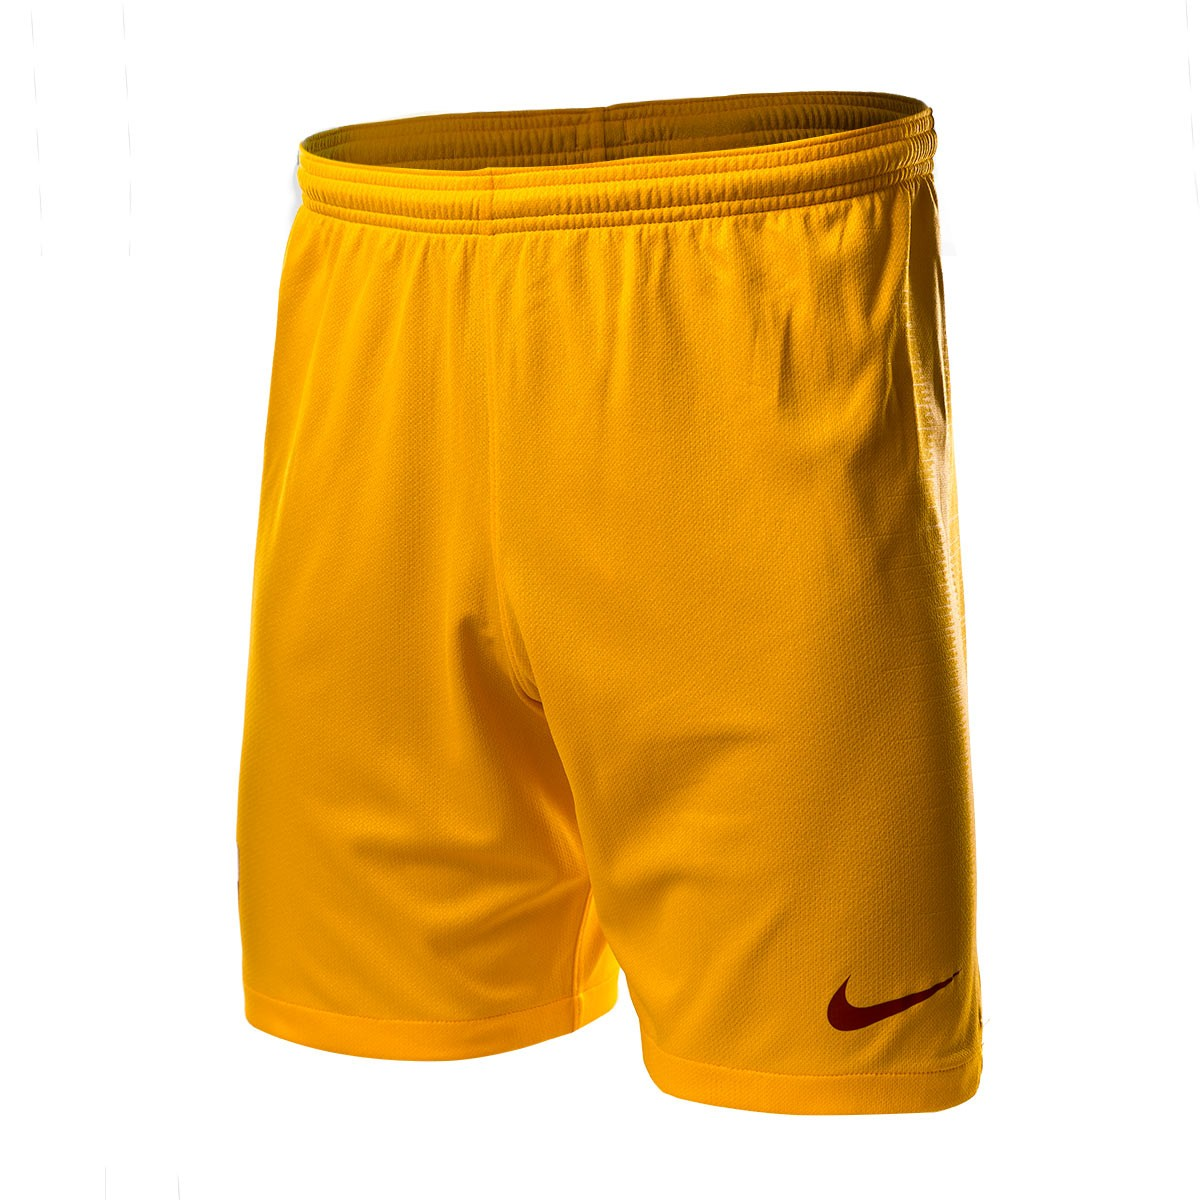 Pantalón corto Nike AS Roma Stadium Tercera Equipación 2018-2019 University  gold-Mars stone - Soloporteros es ahora Fútbol Emotion 8e1be305cceb7